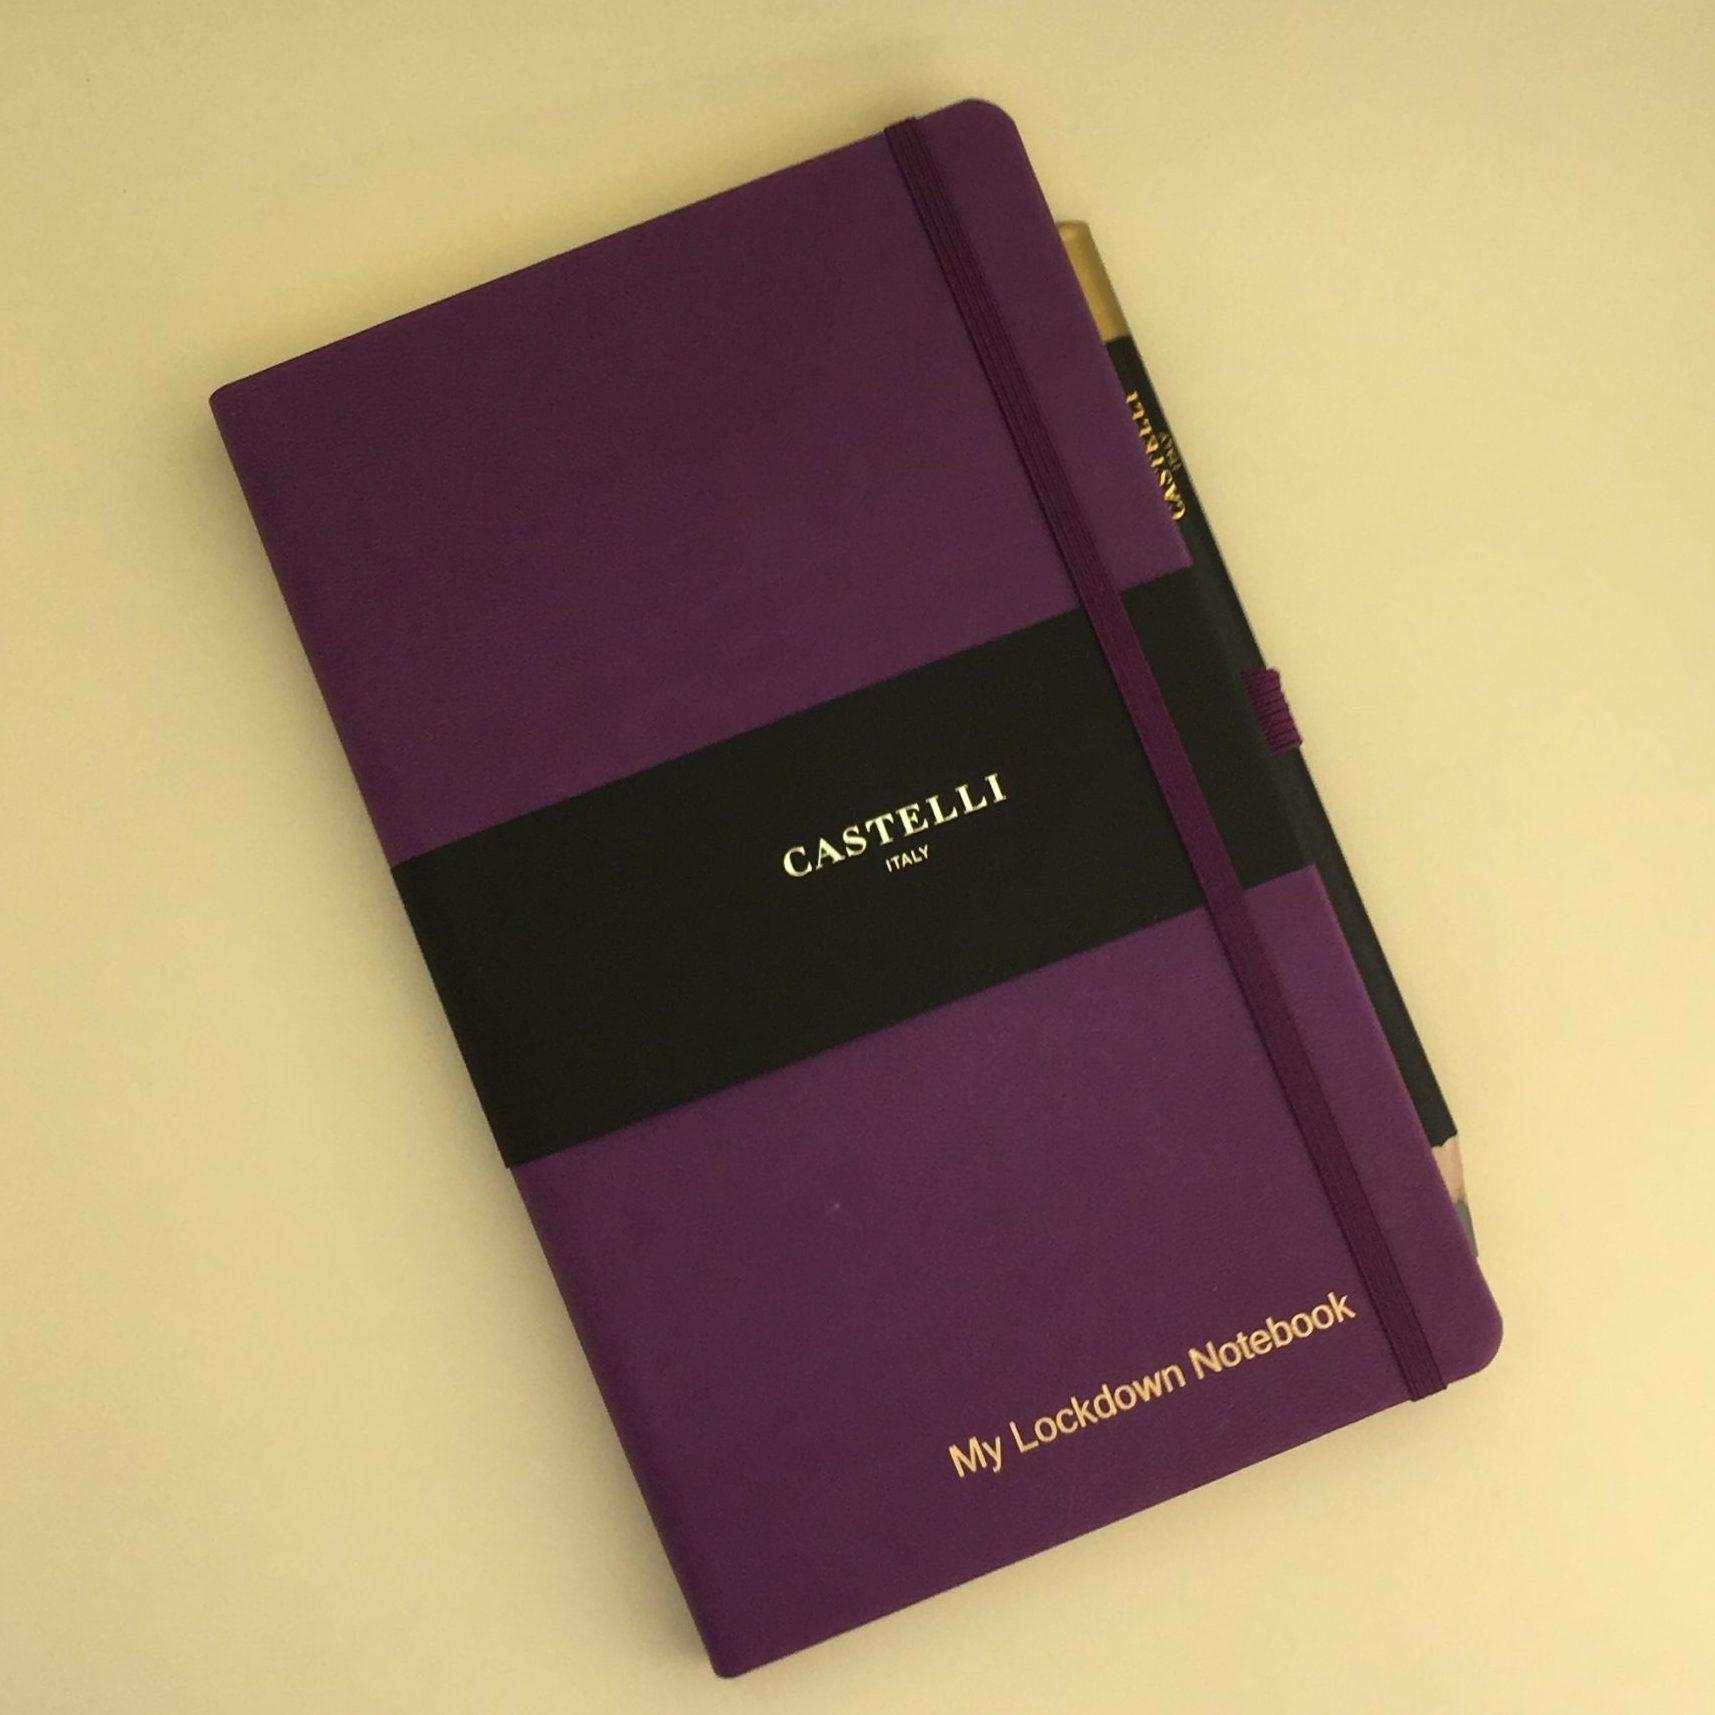 Special Edition - My Lockdown Castelli Notebook